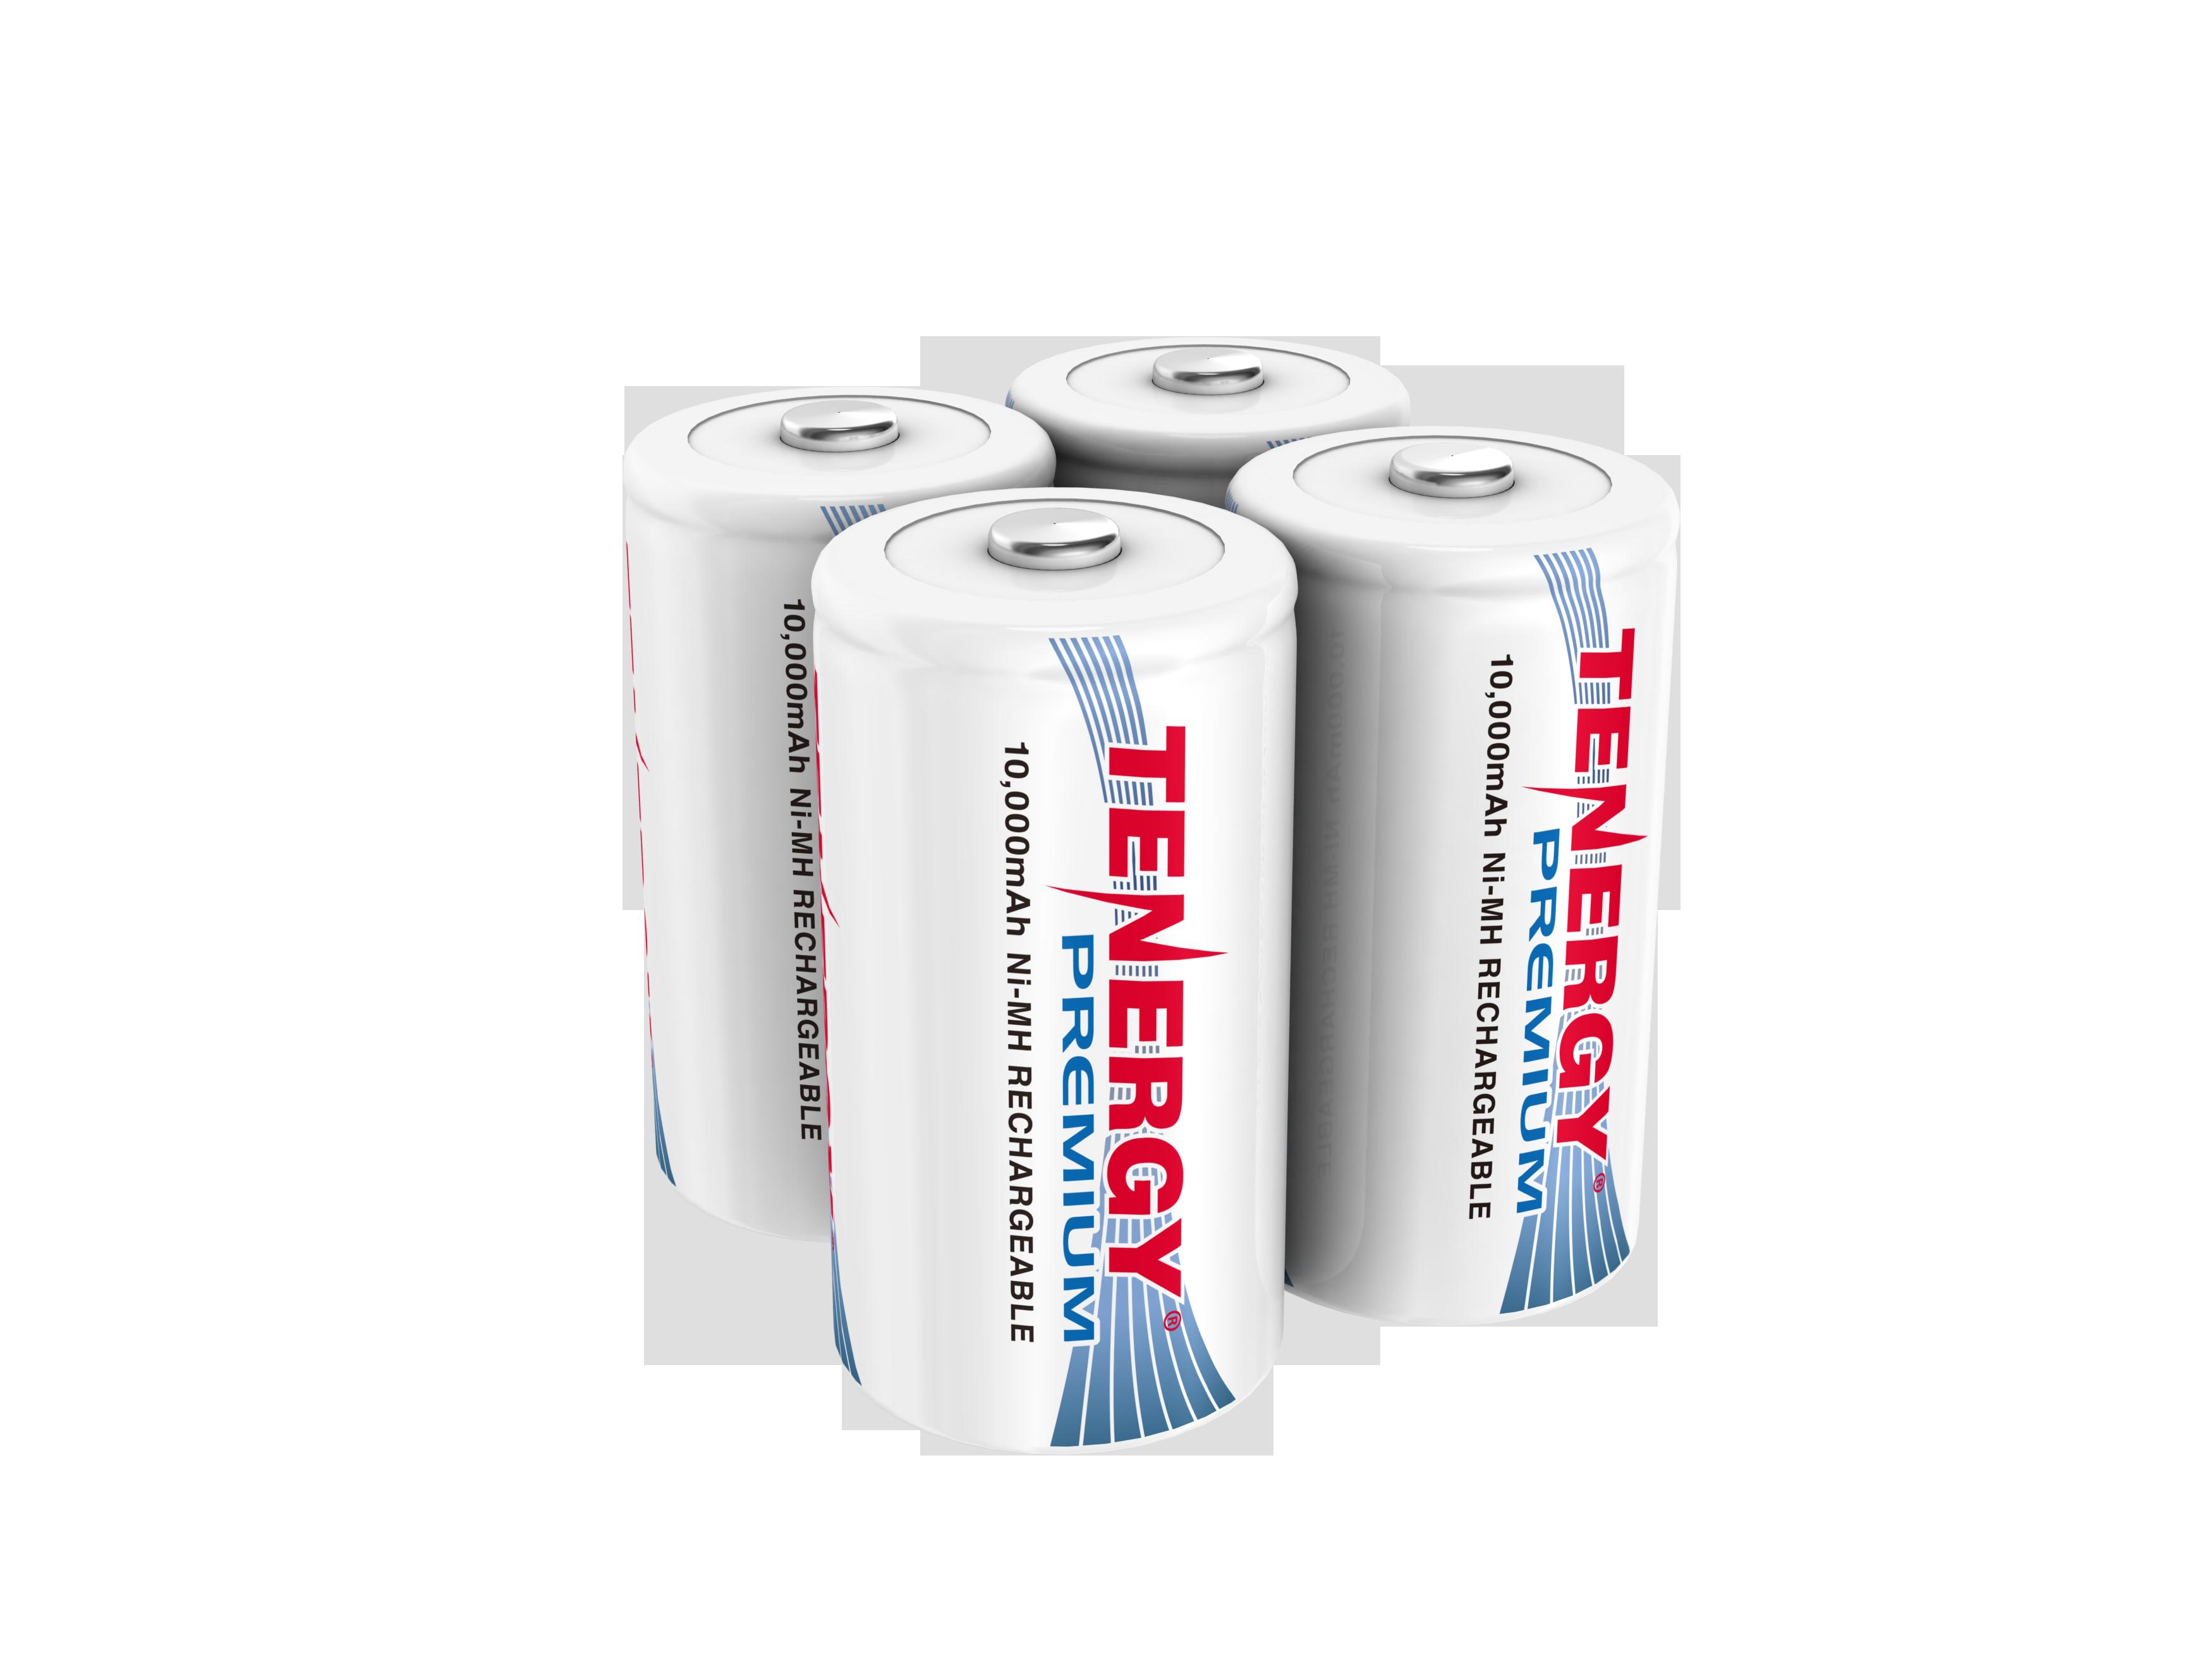 Combo 4pcs Tenergy Premium D 10 000mah Nimh Rechargeable Batteries Rechargeable Batteries Nimh Batteries